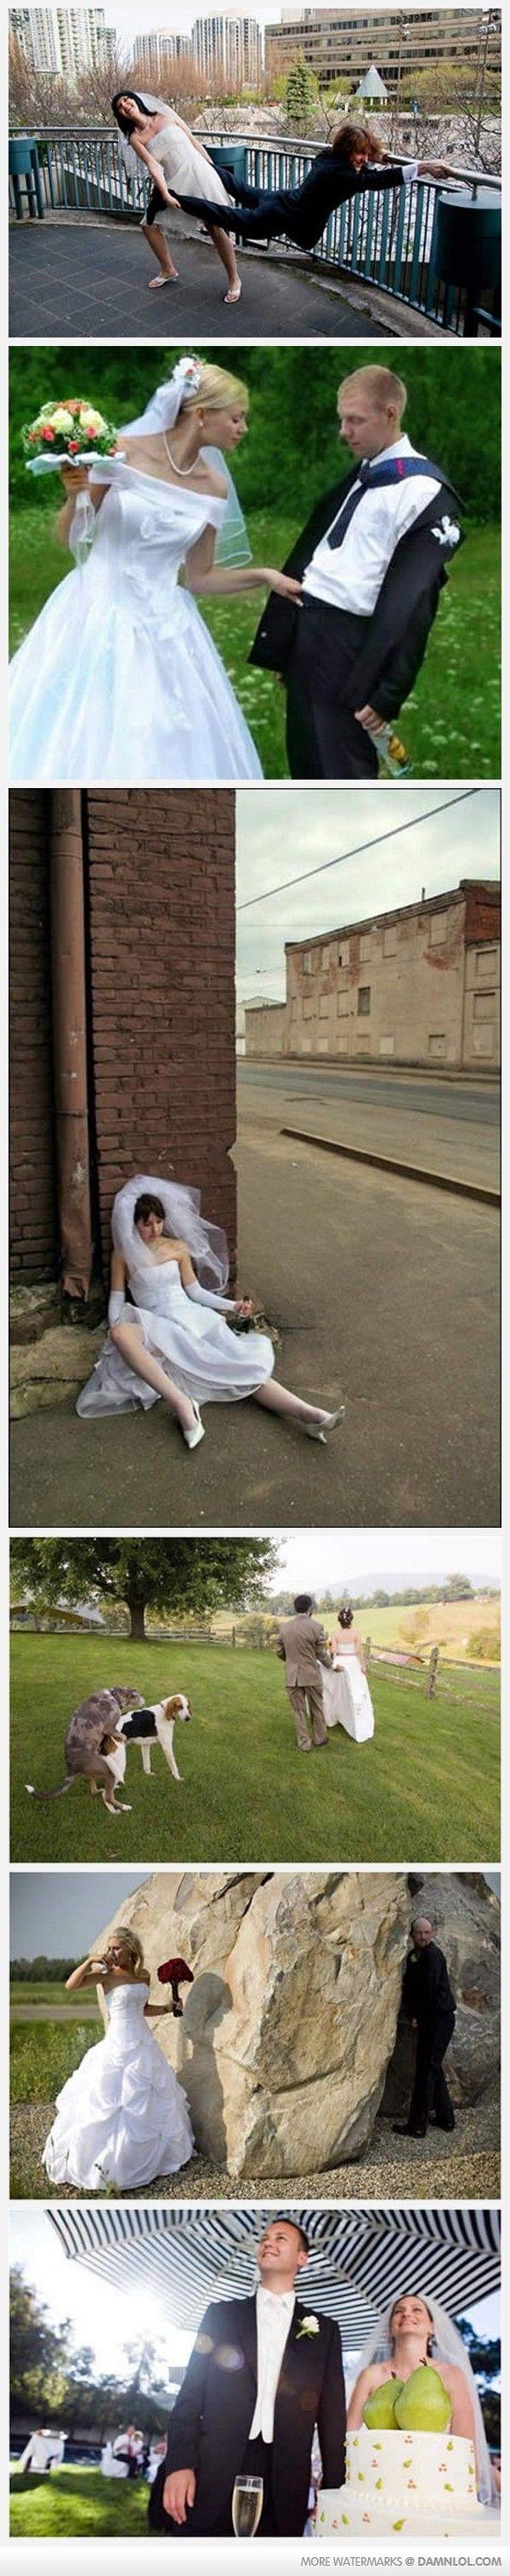 Wedding photo fails 1